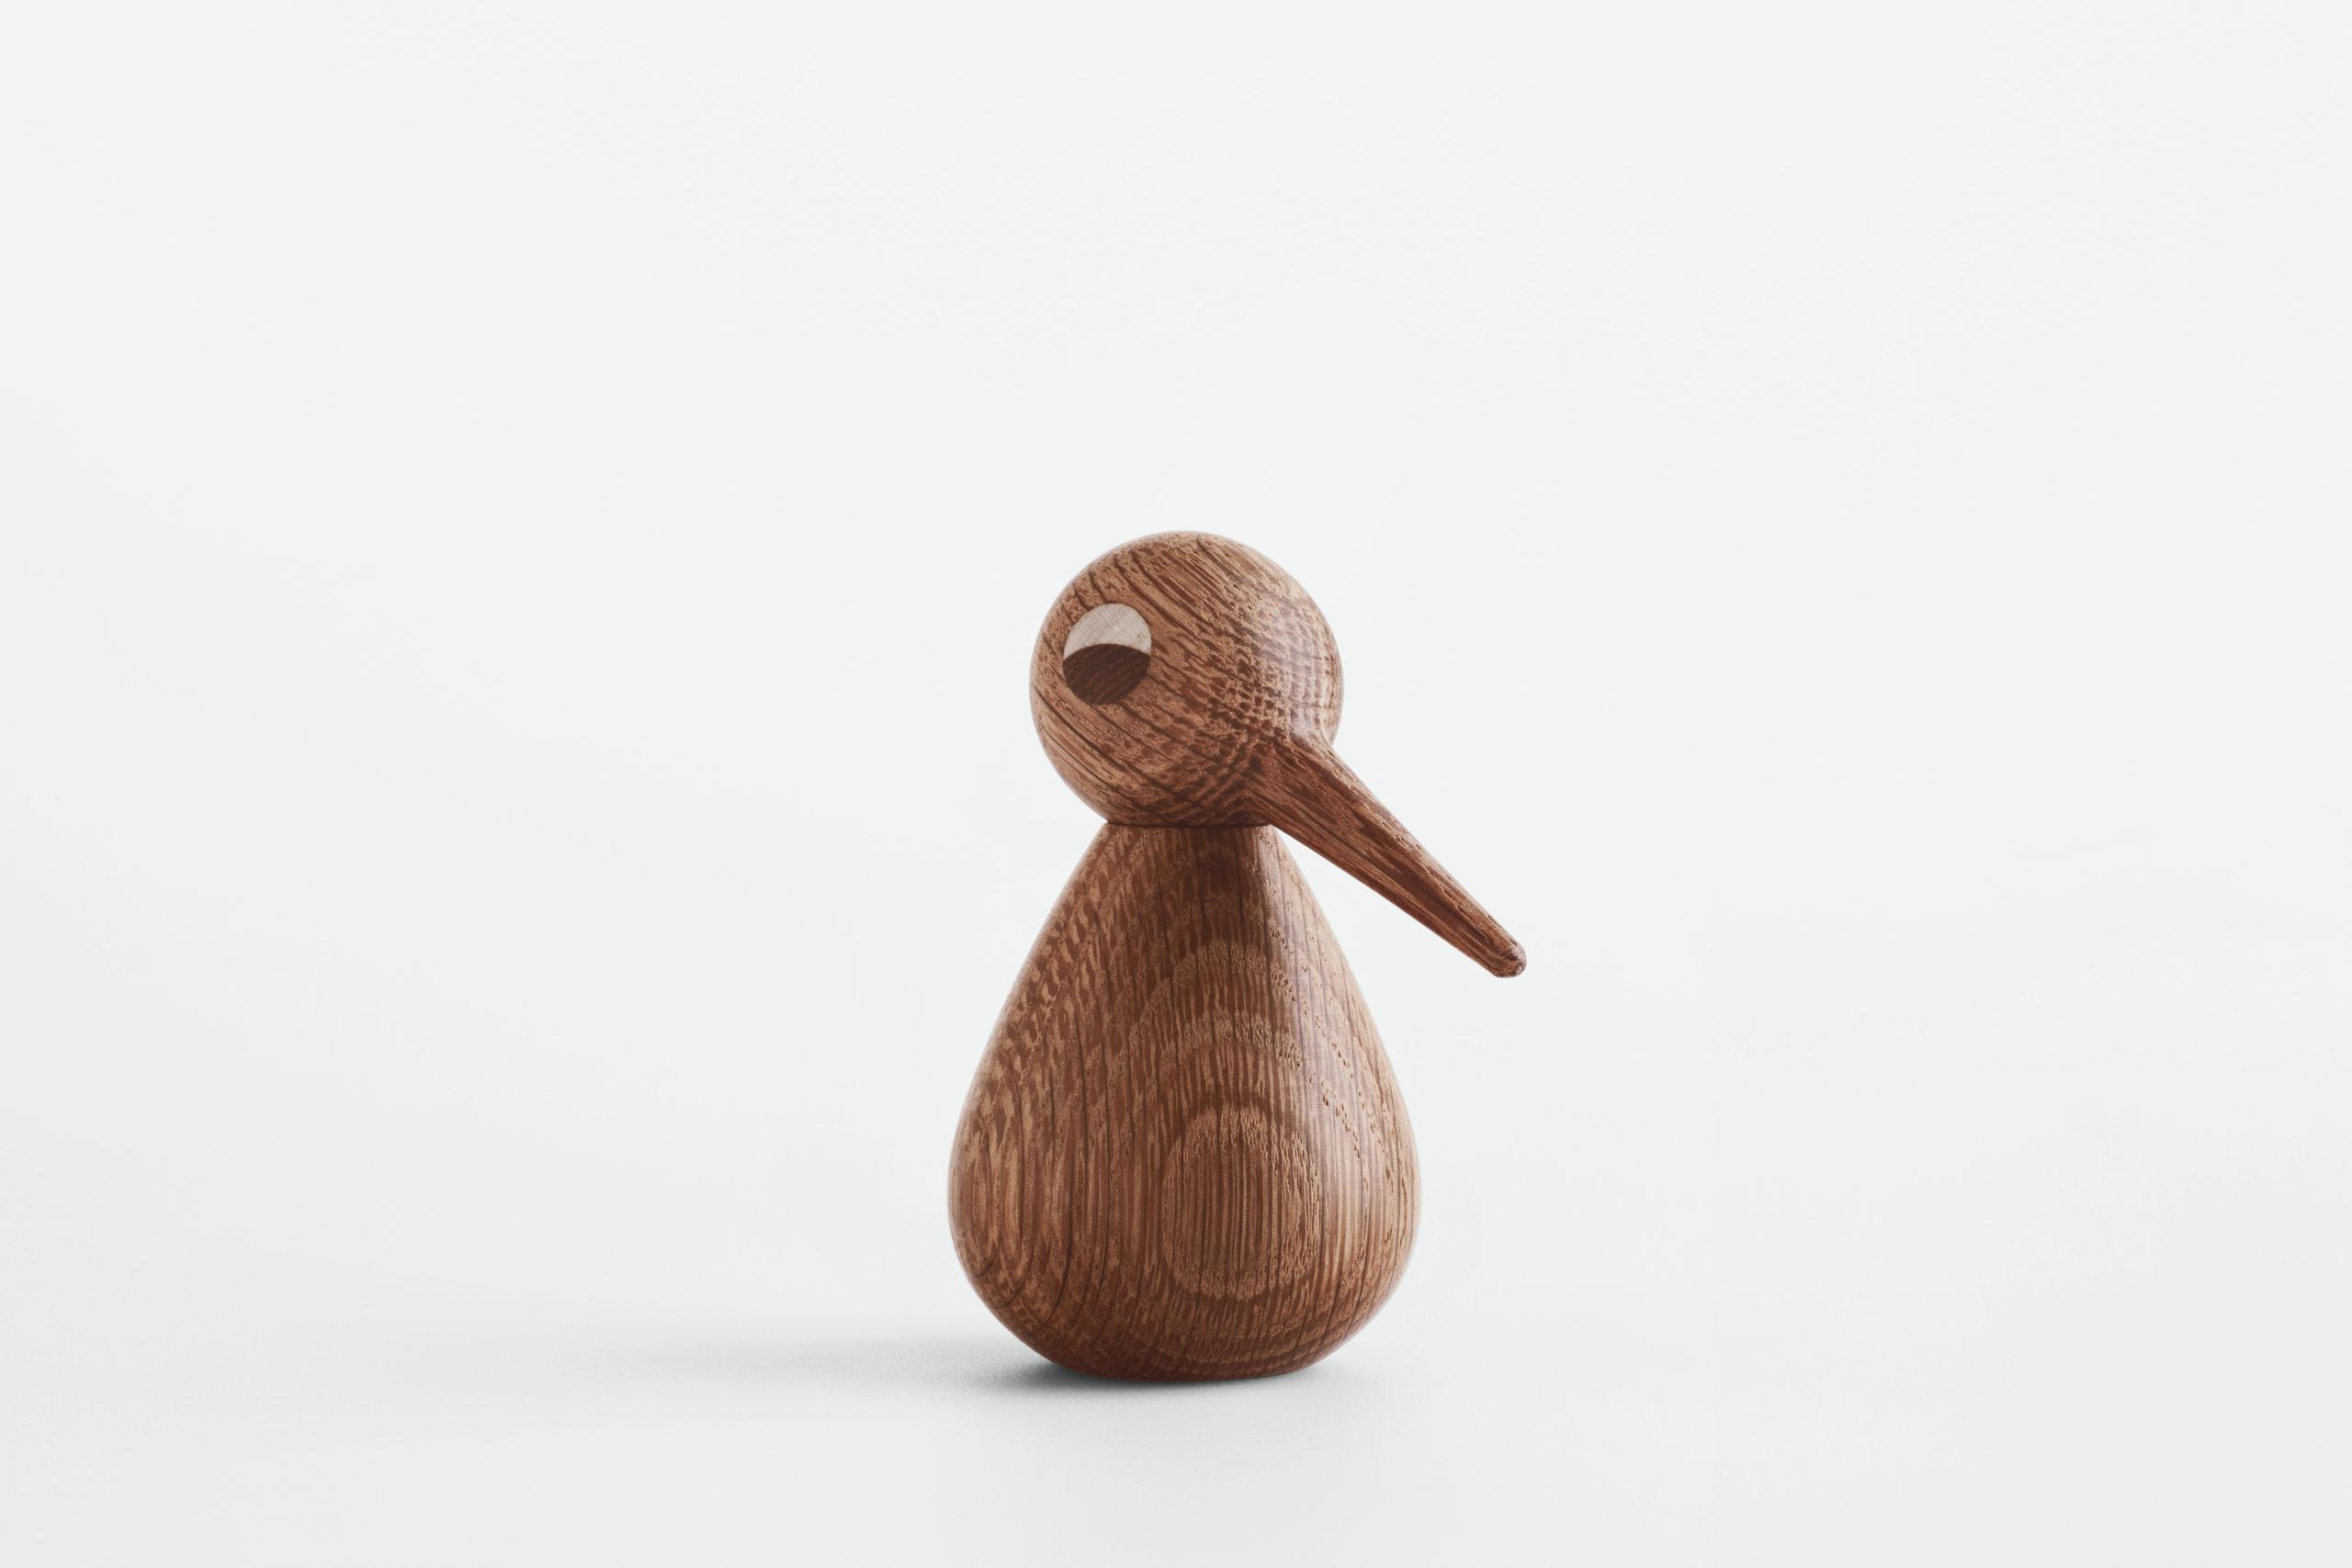 Architectmade-Bird-Small-Smoked-Oak-Kristian-Vedel